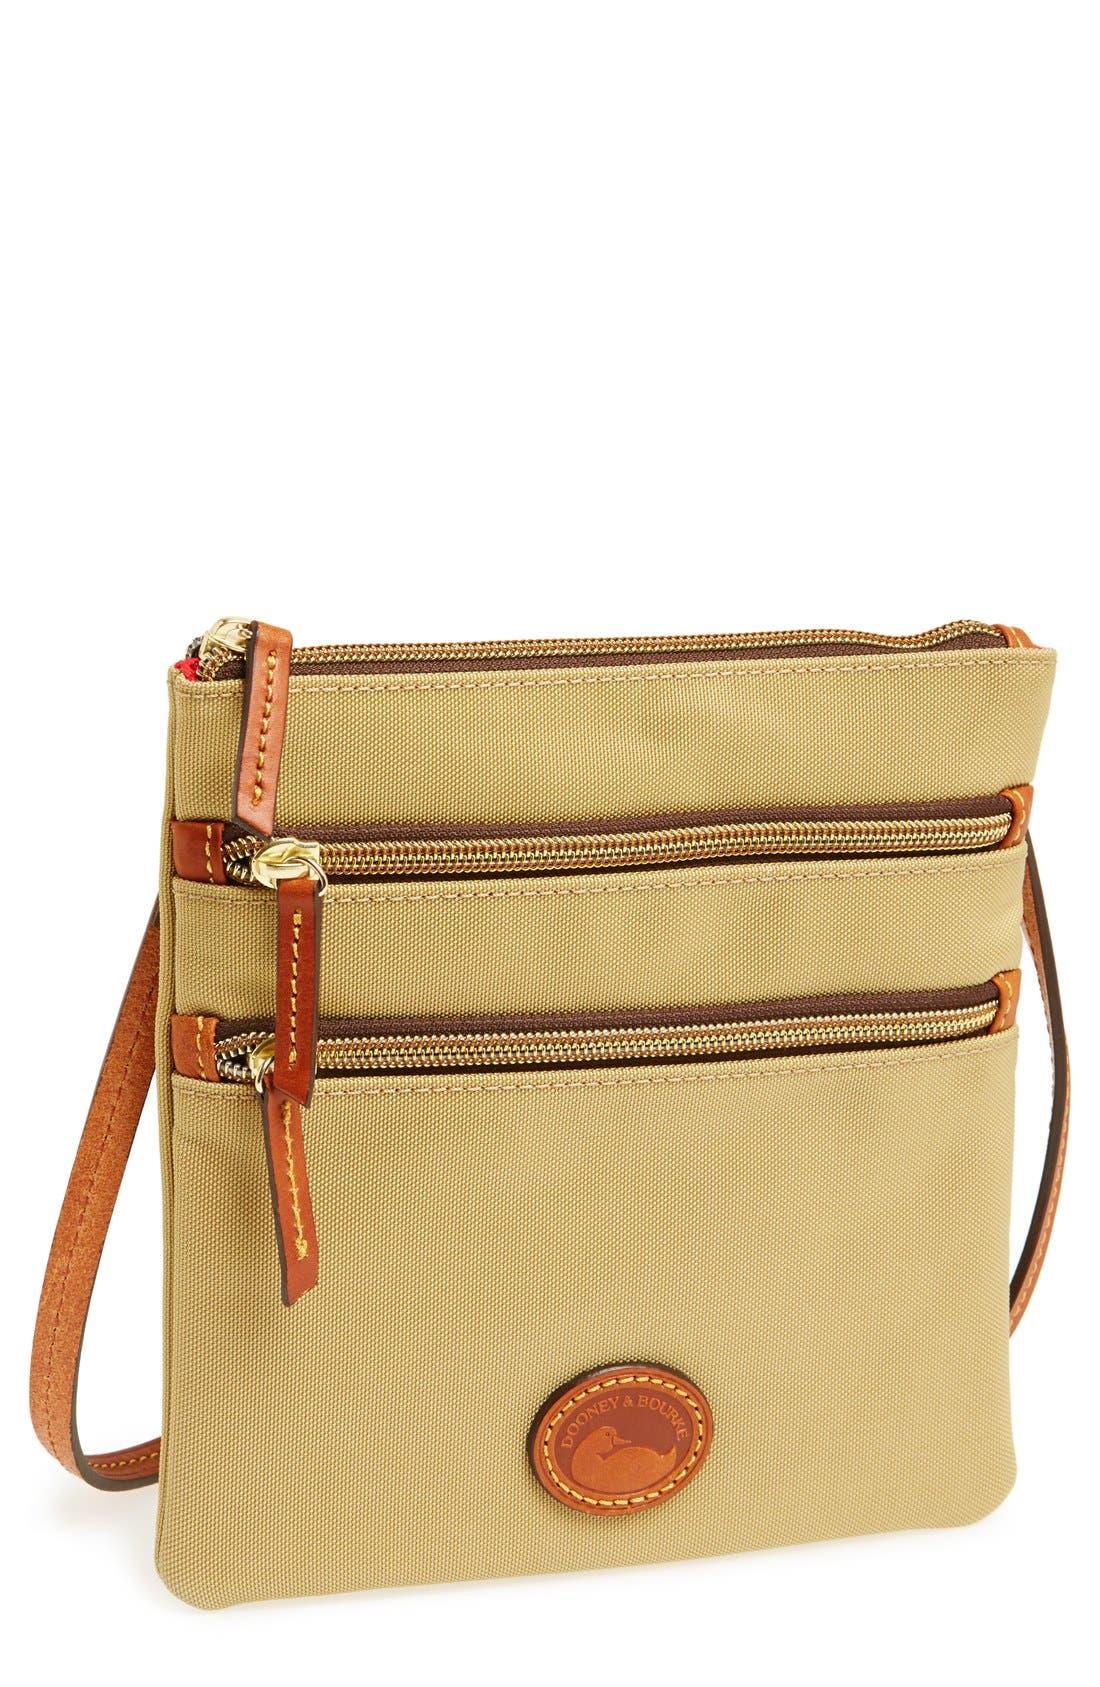 Main Image - Dooney & Bourke Triple Zip Nylon Crossbody Bag